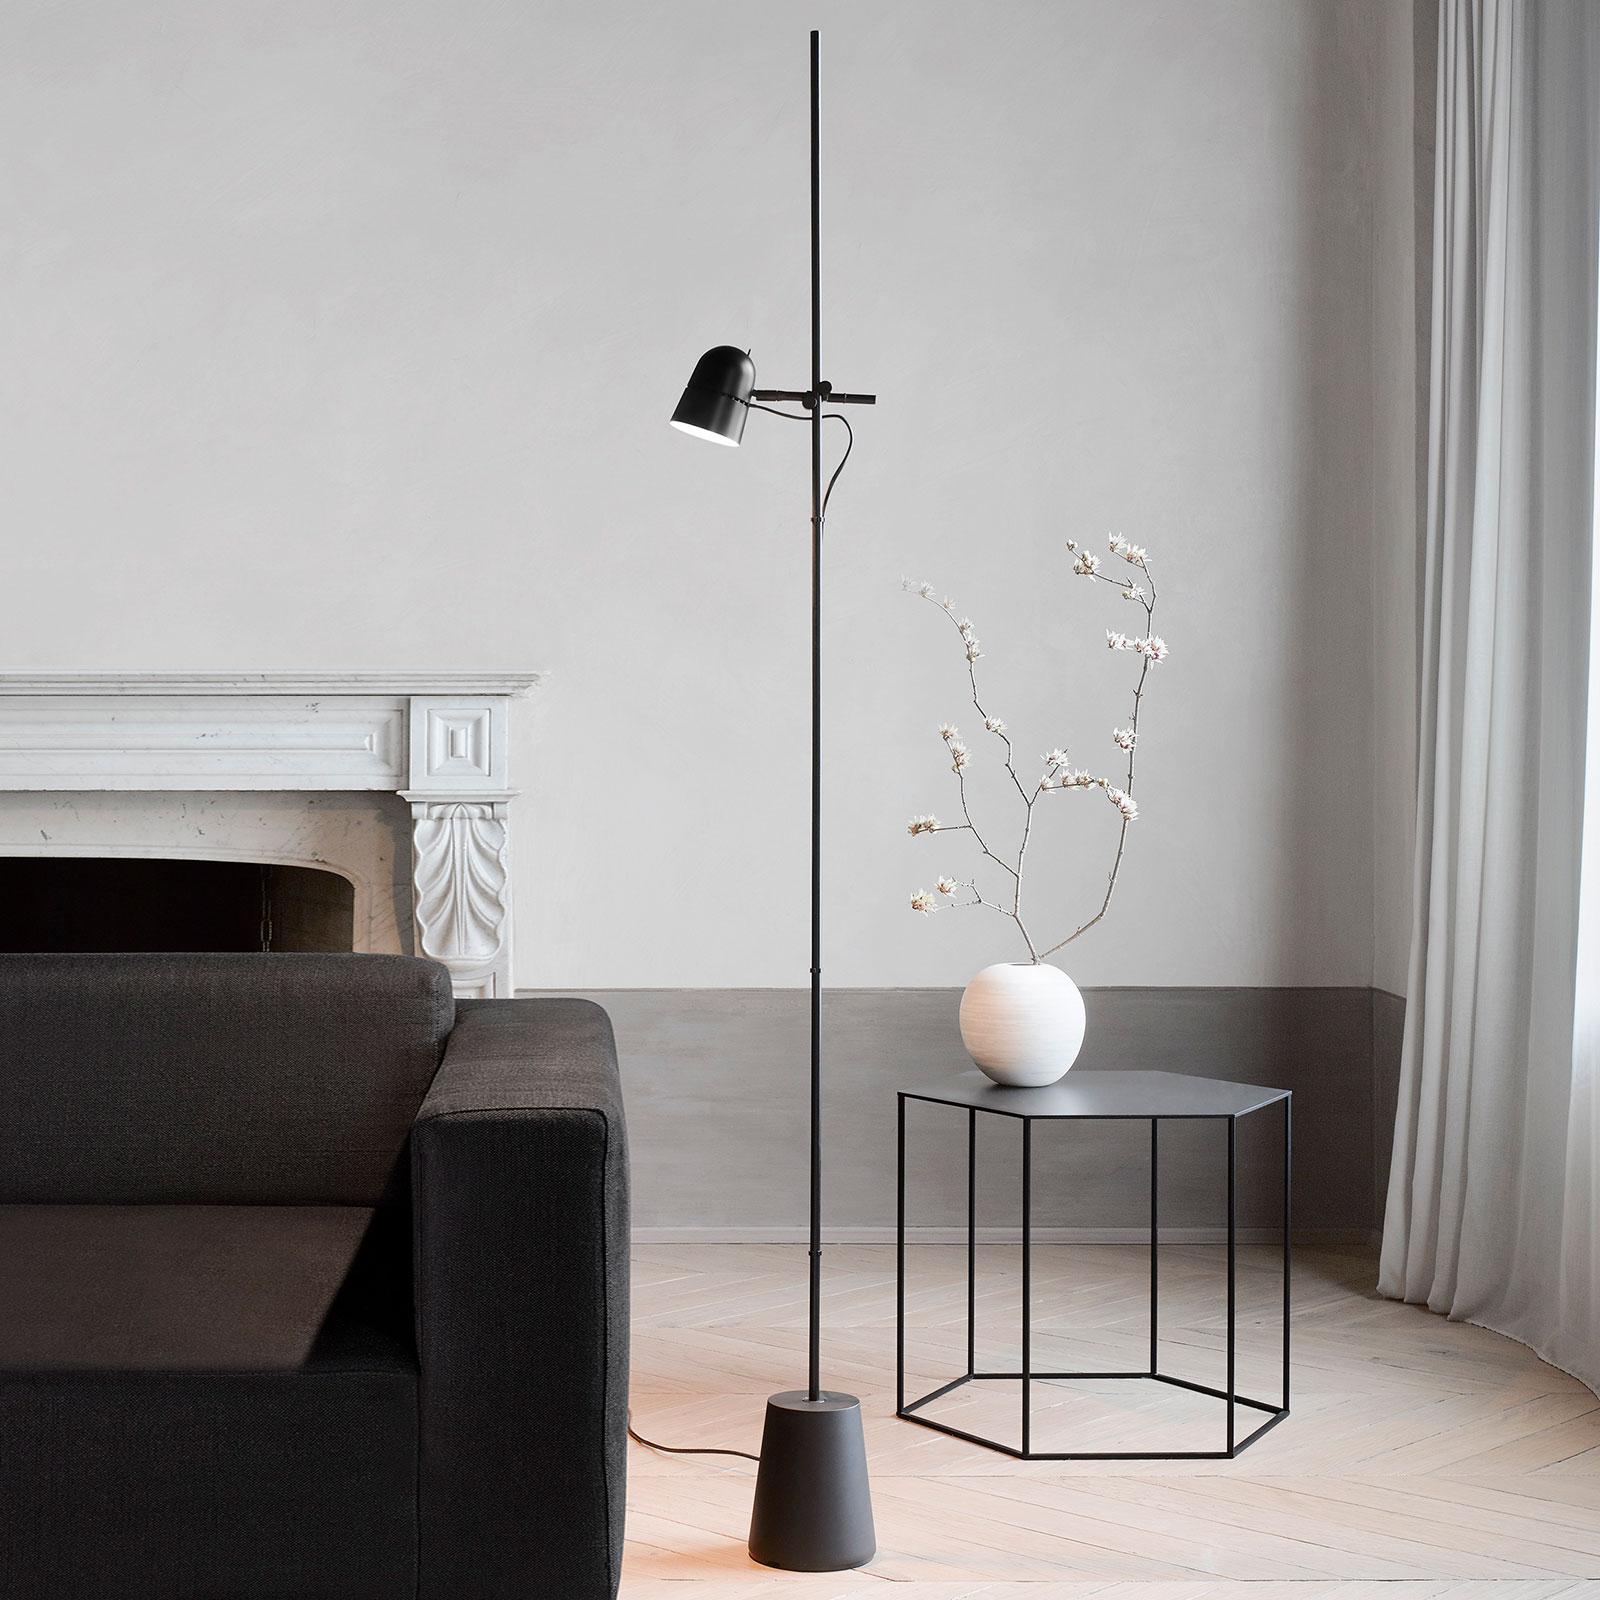 Luceplan Counterbalance lampa stojąca LED, czarna